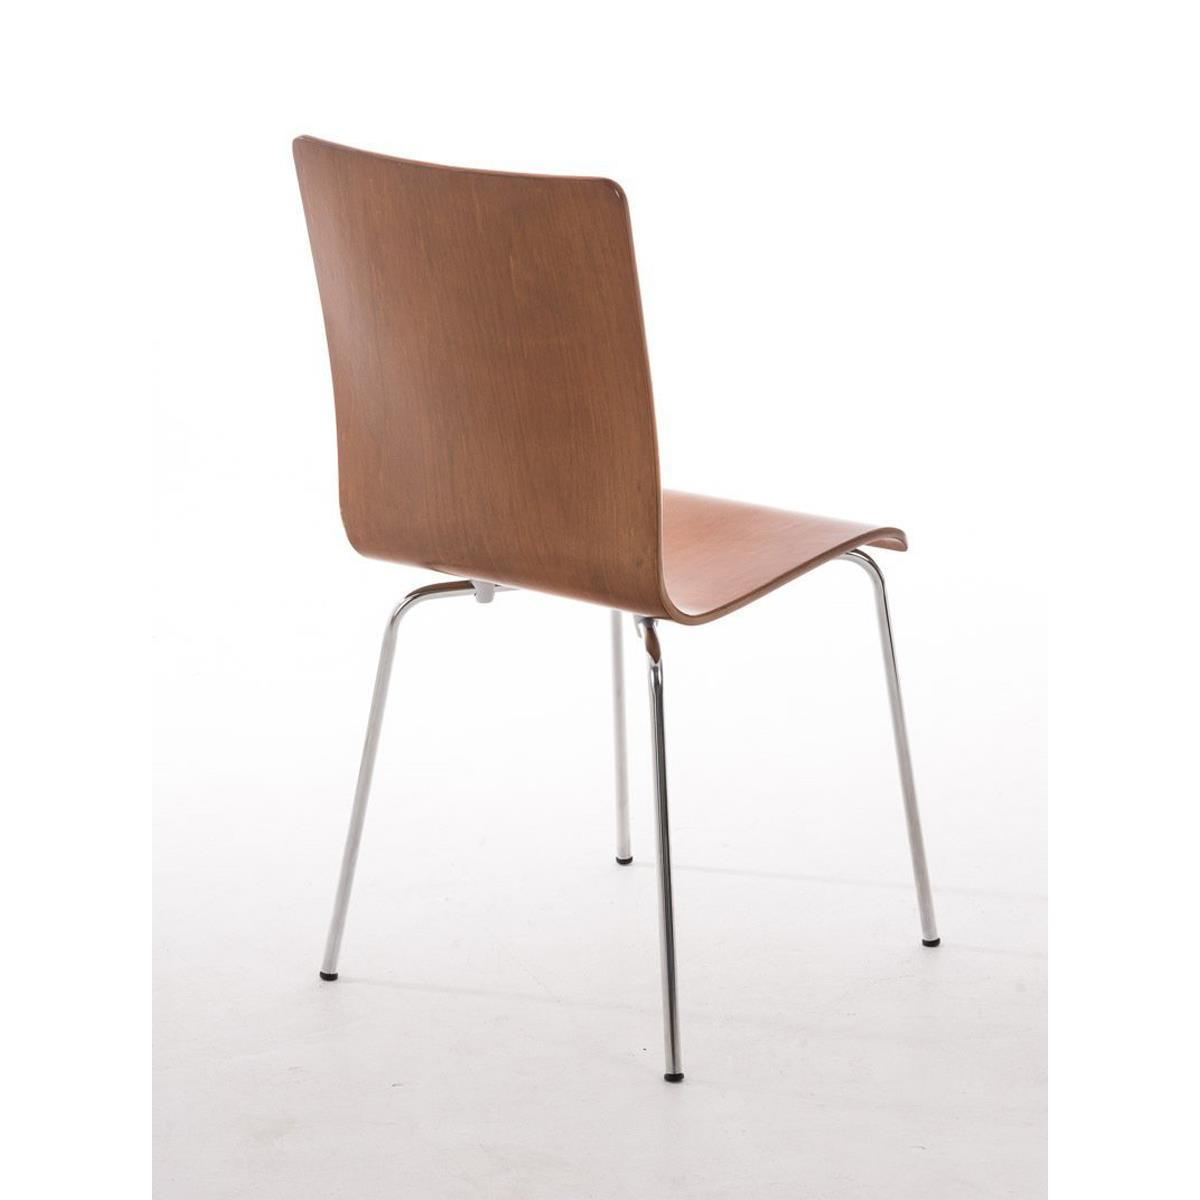 Hermoso sillas cocina madera im genes sillas de cocina - Sillas para cocinas modernas ...